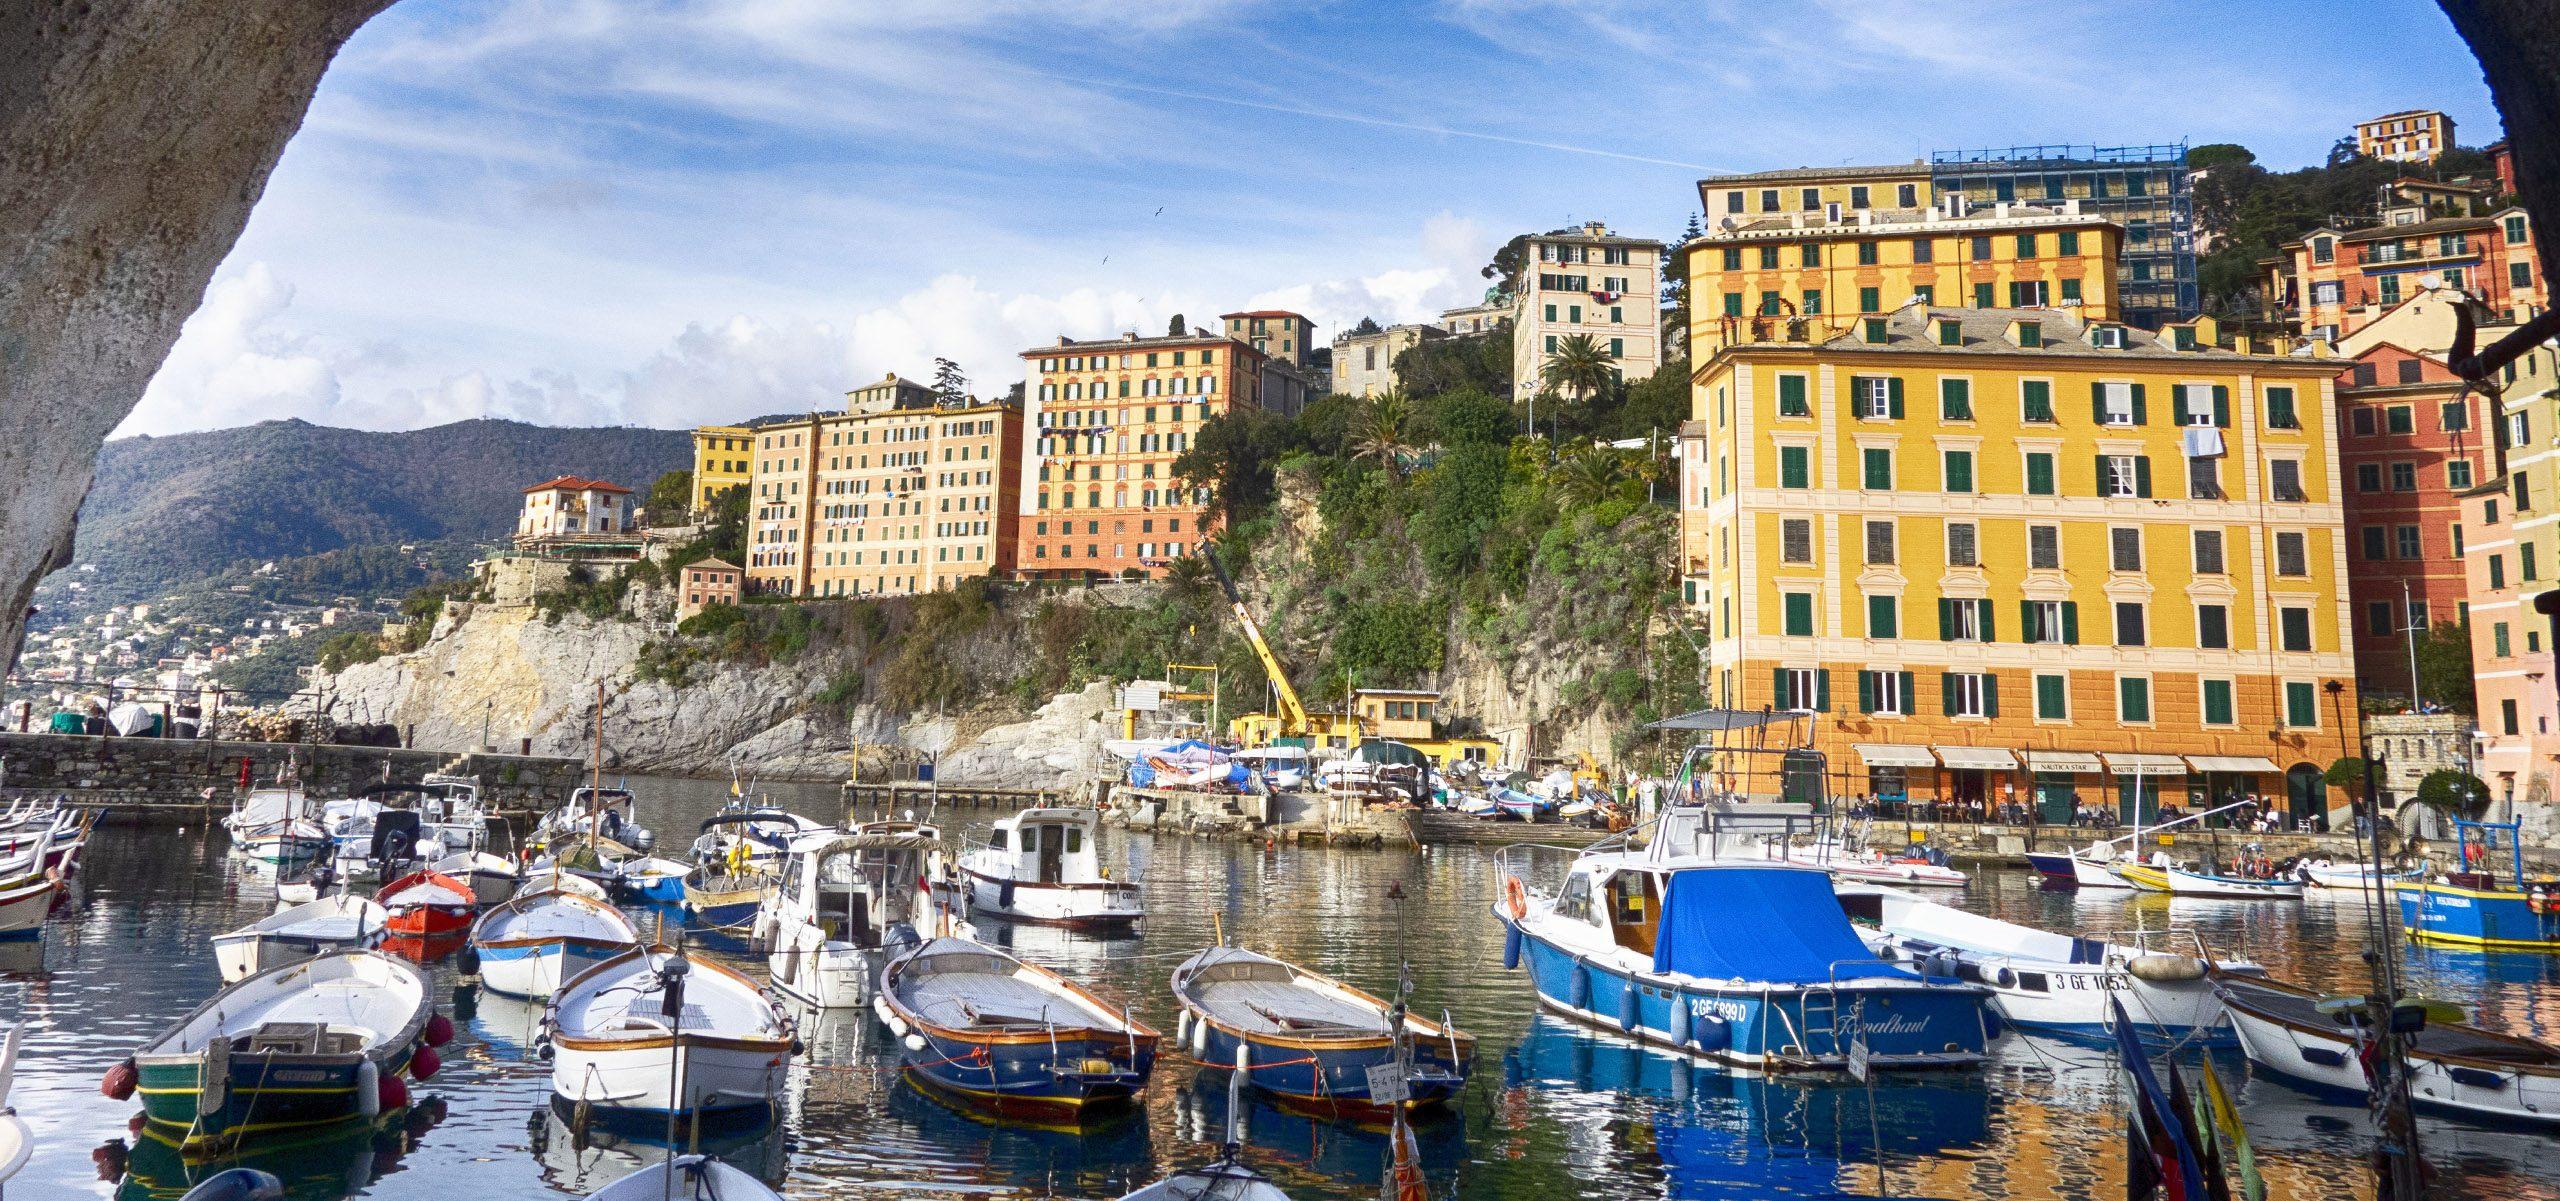 Italy-Liguria Coast- Camogli